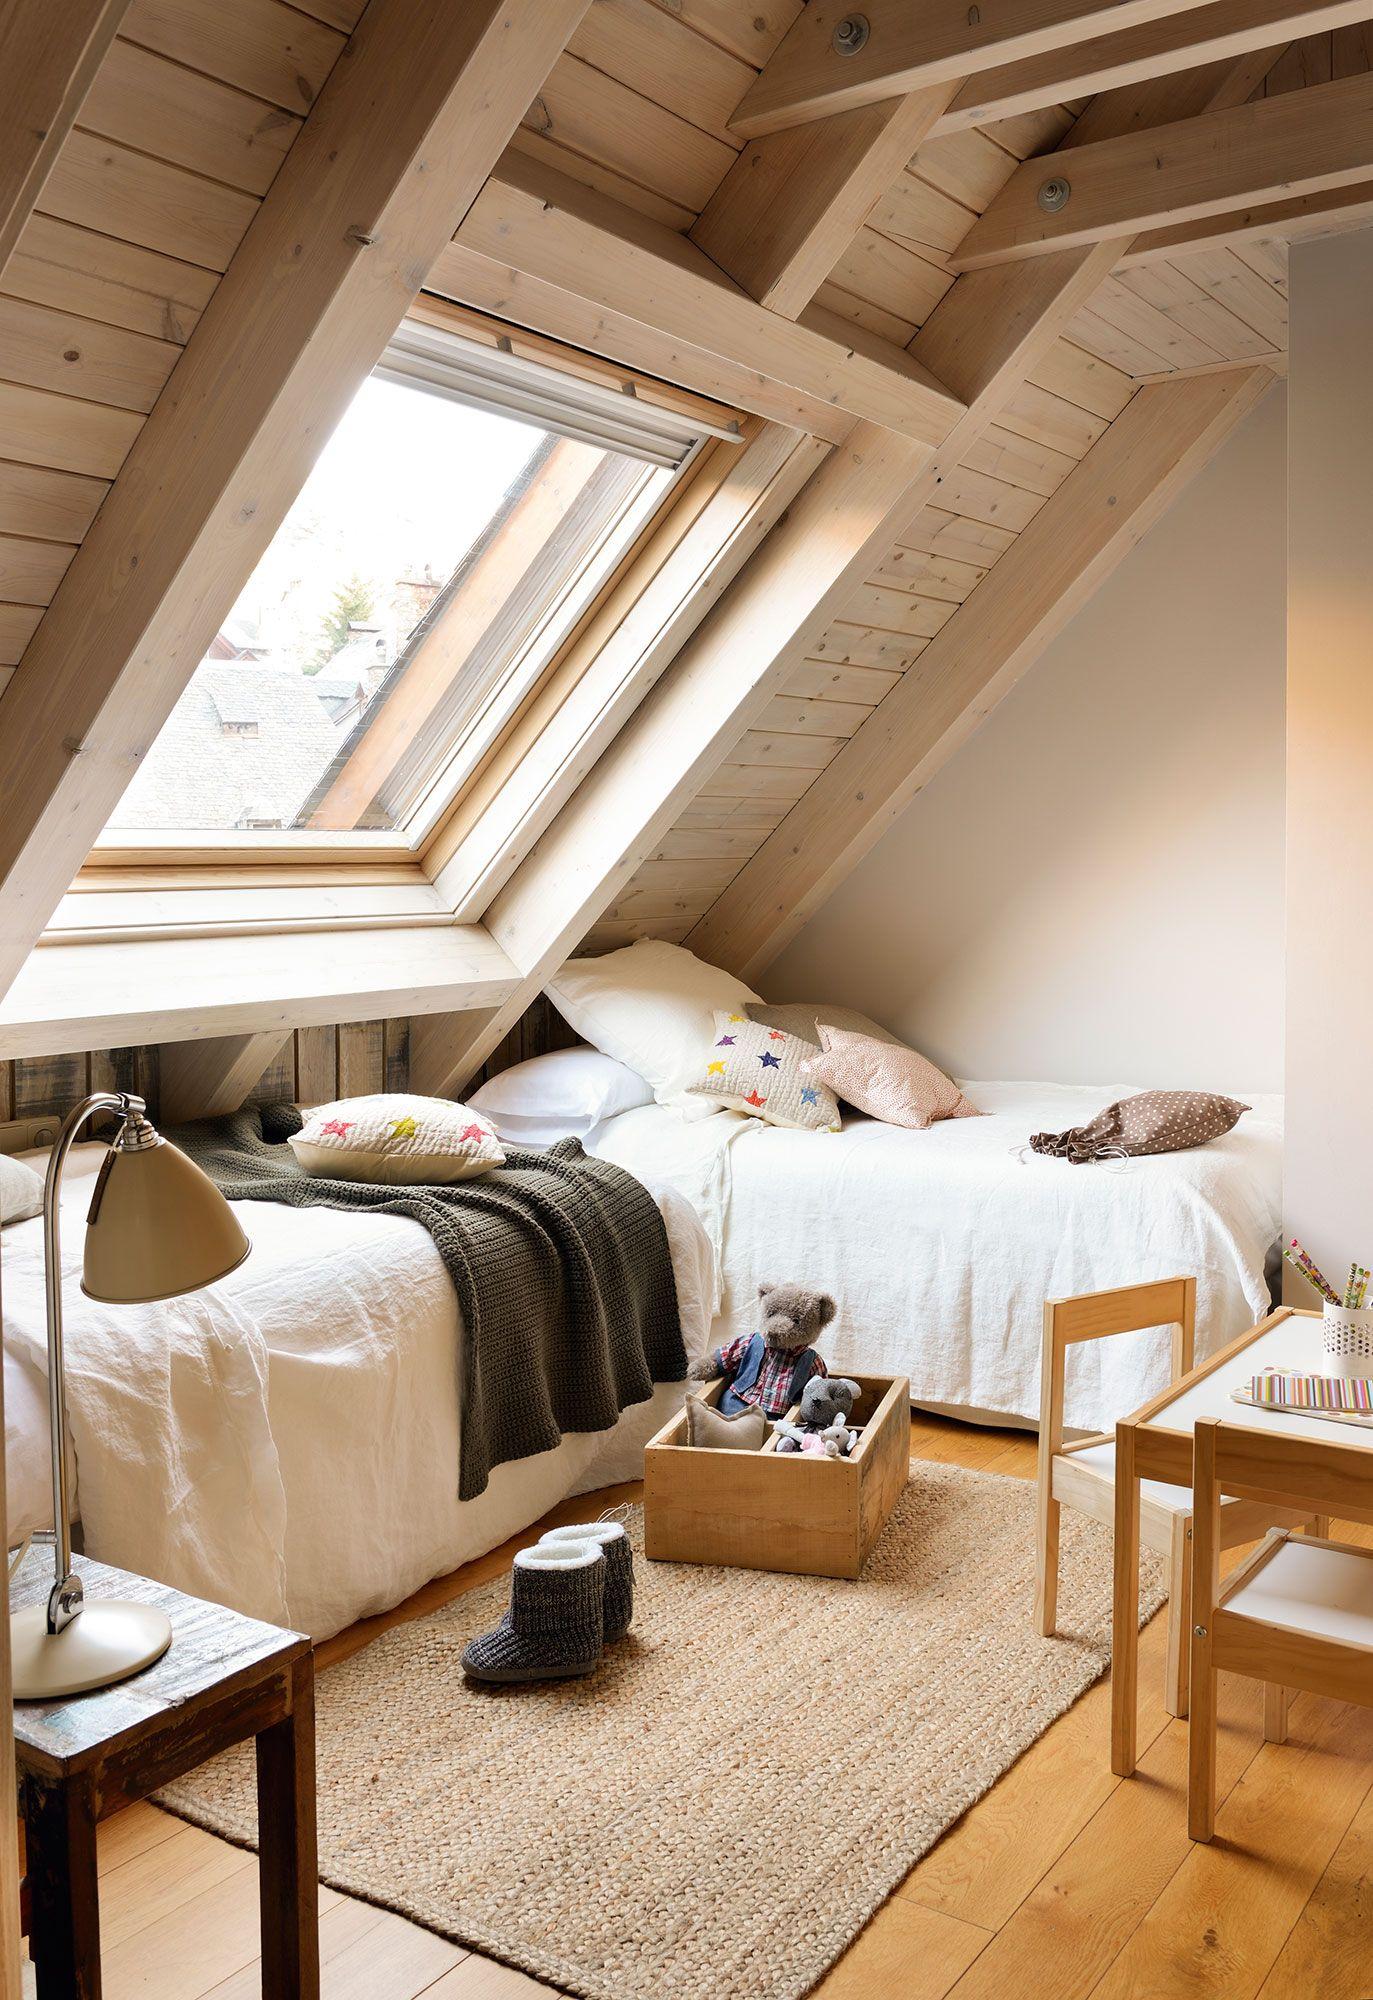 Dormitorio infantil en buhardilla de monta a la ni a for Diseno de buhardillas